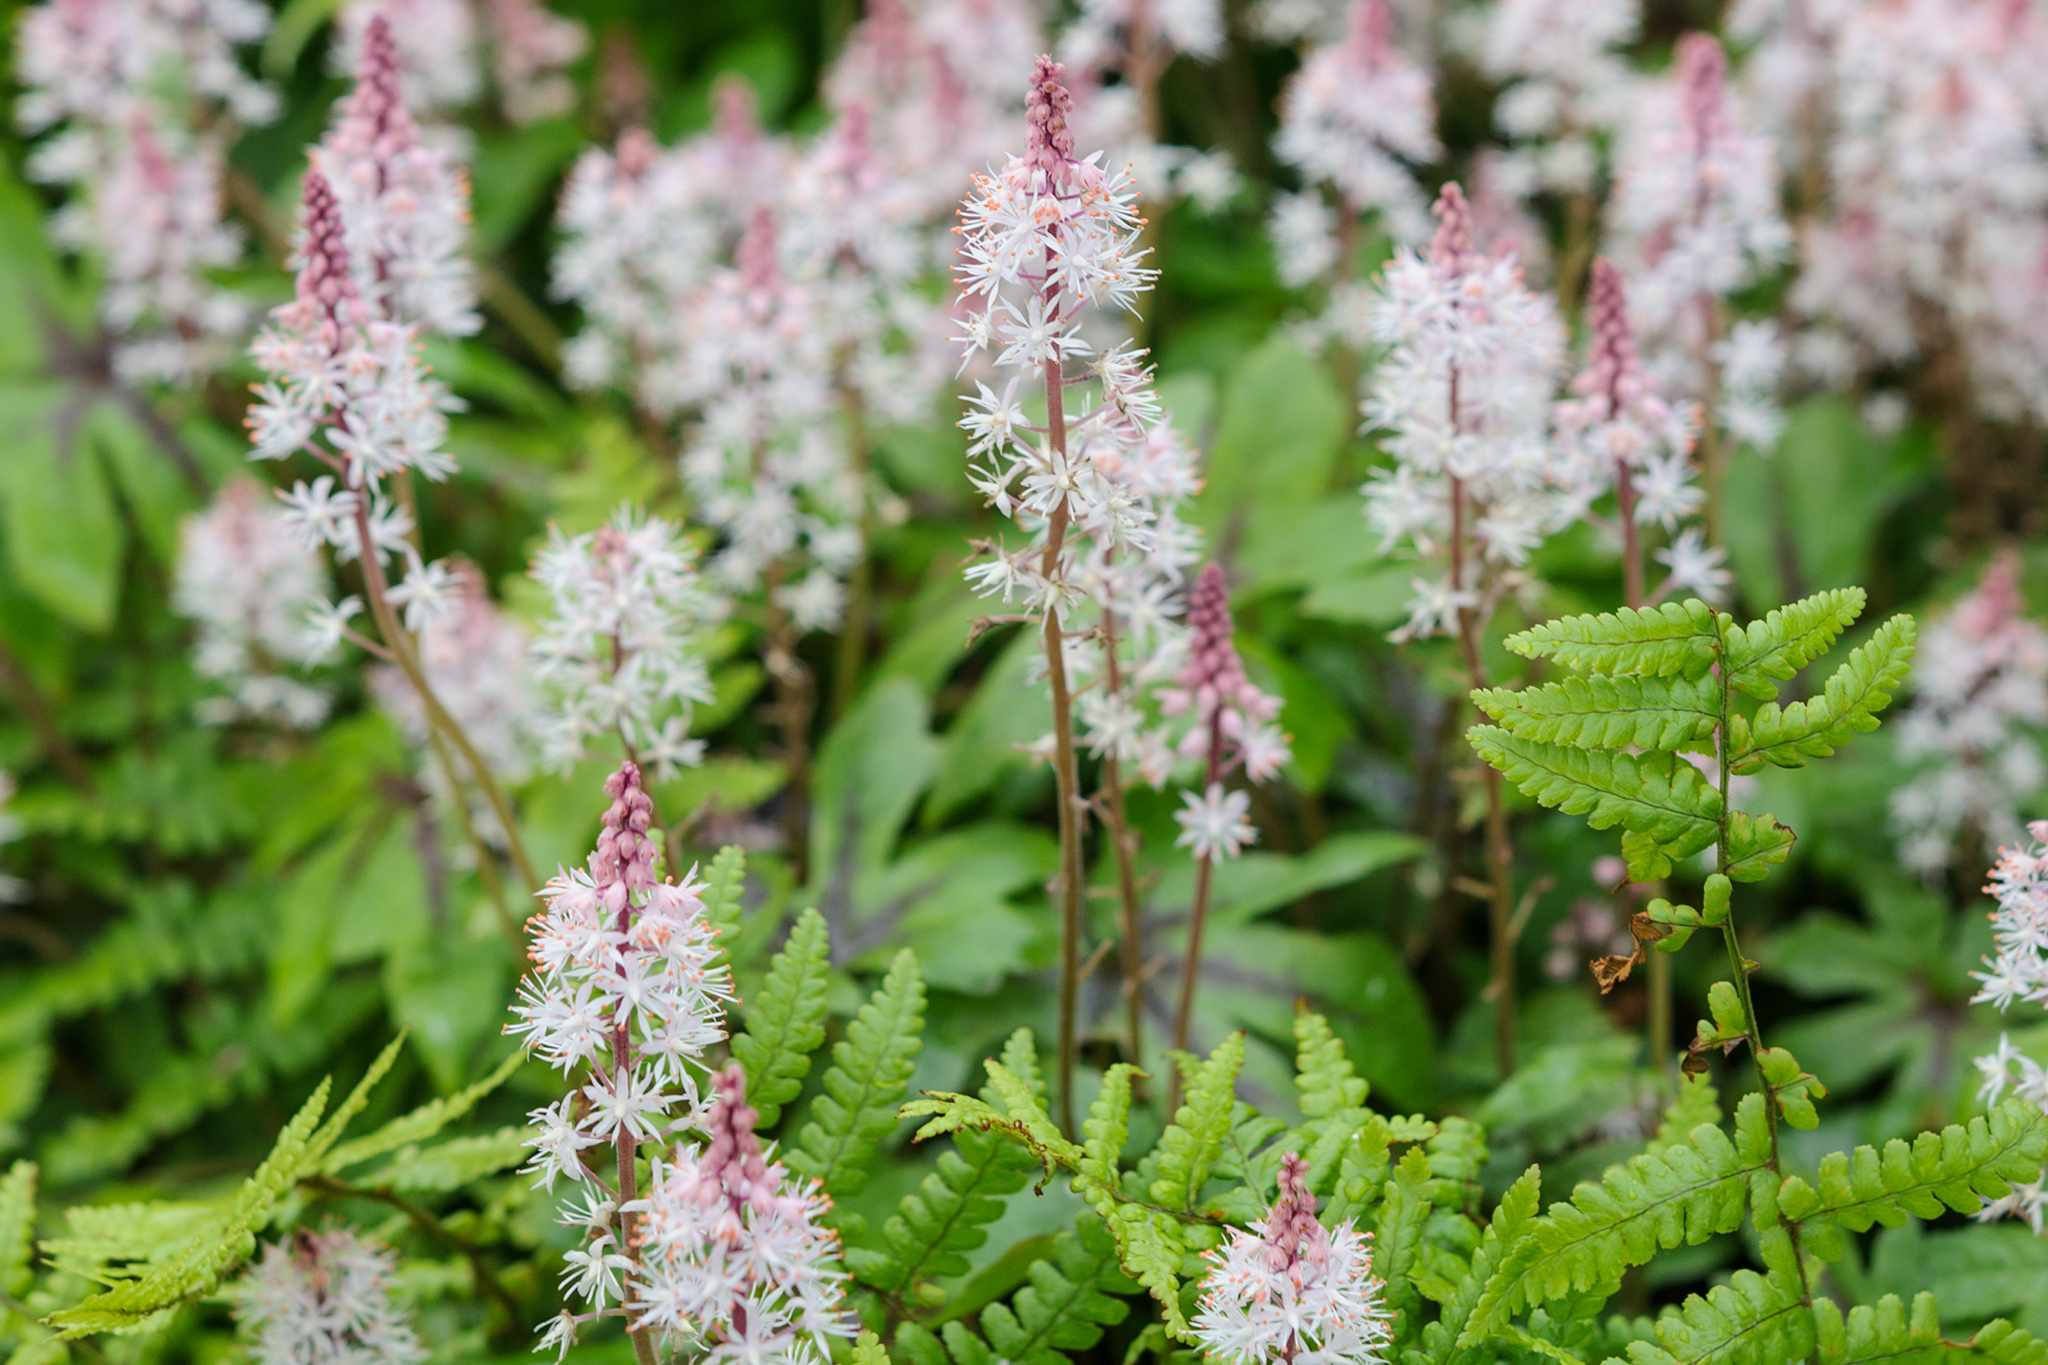 Tiarella flowers